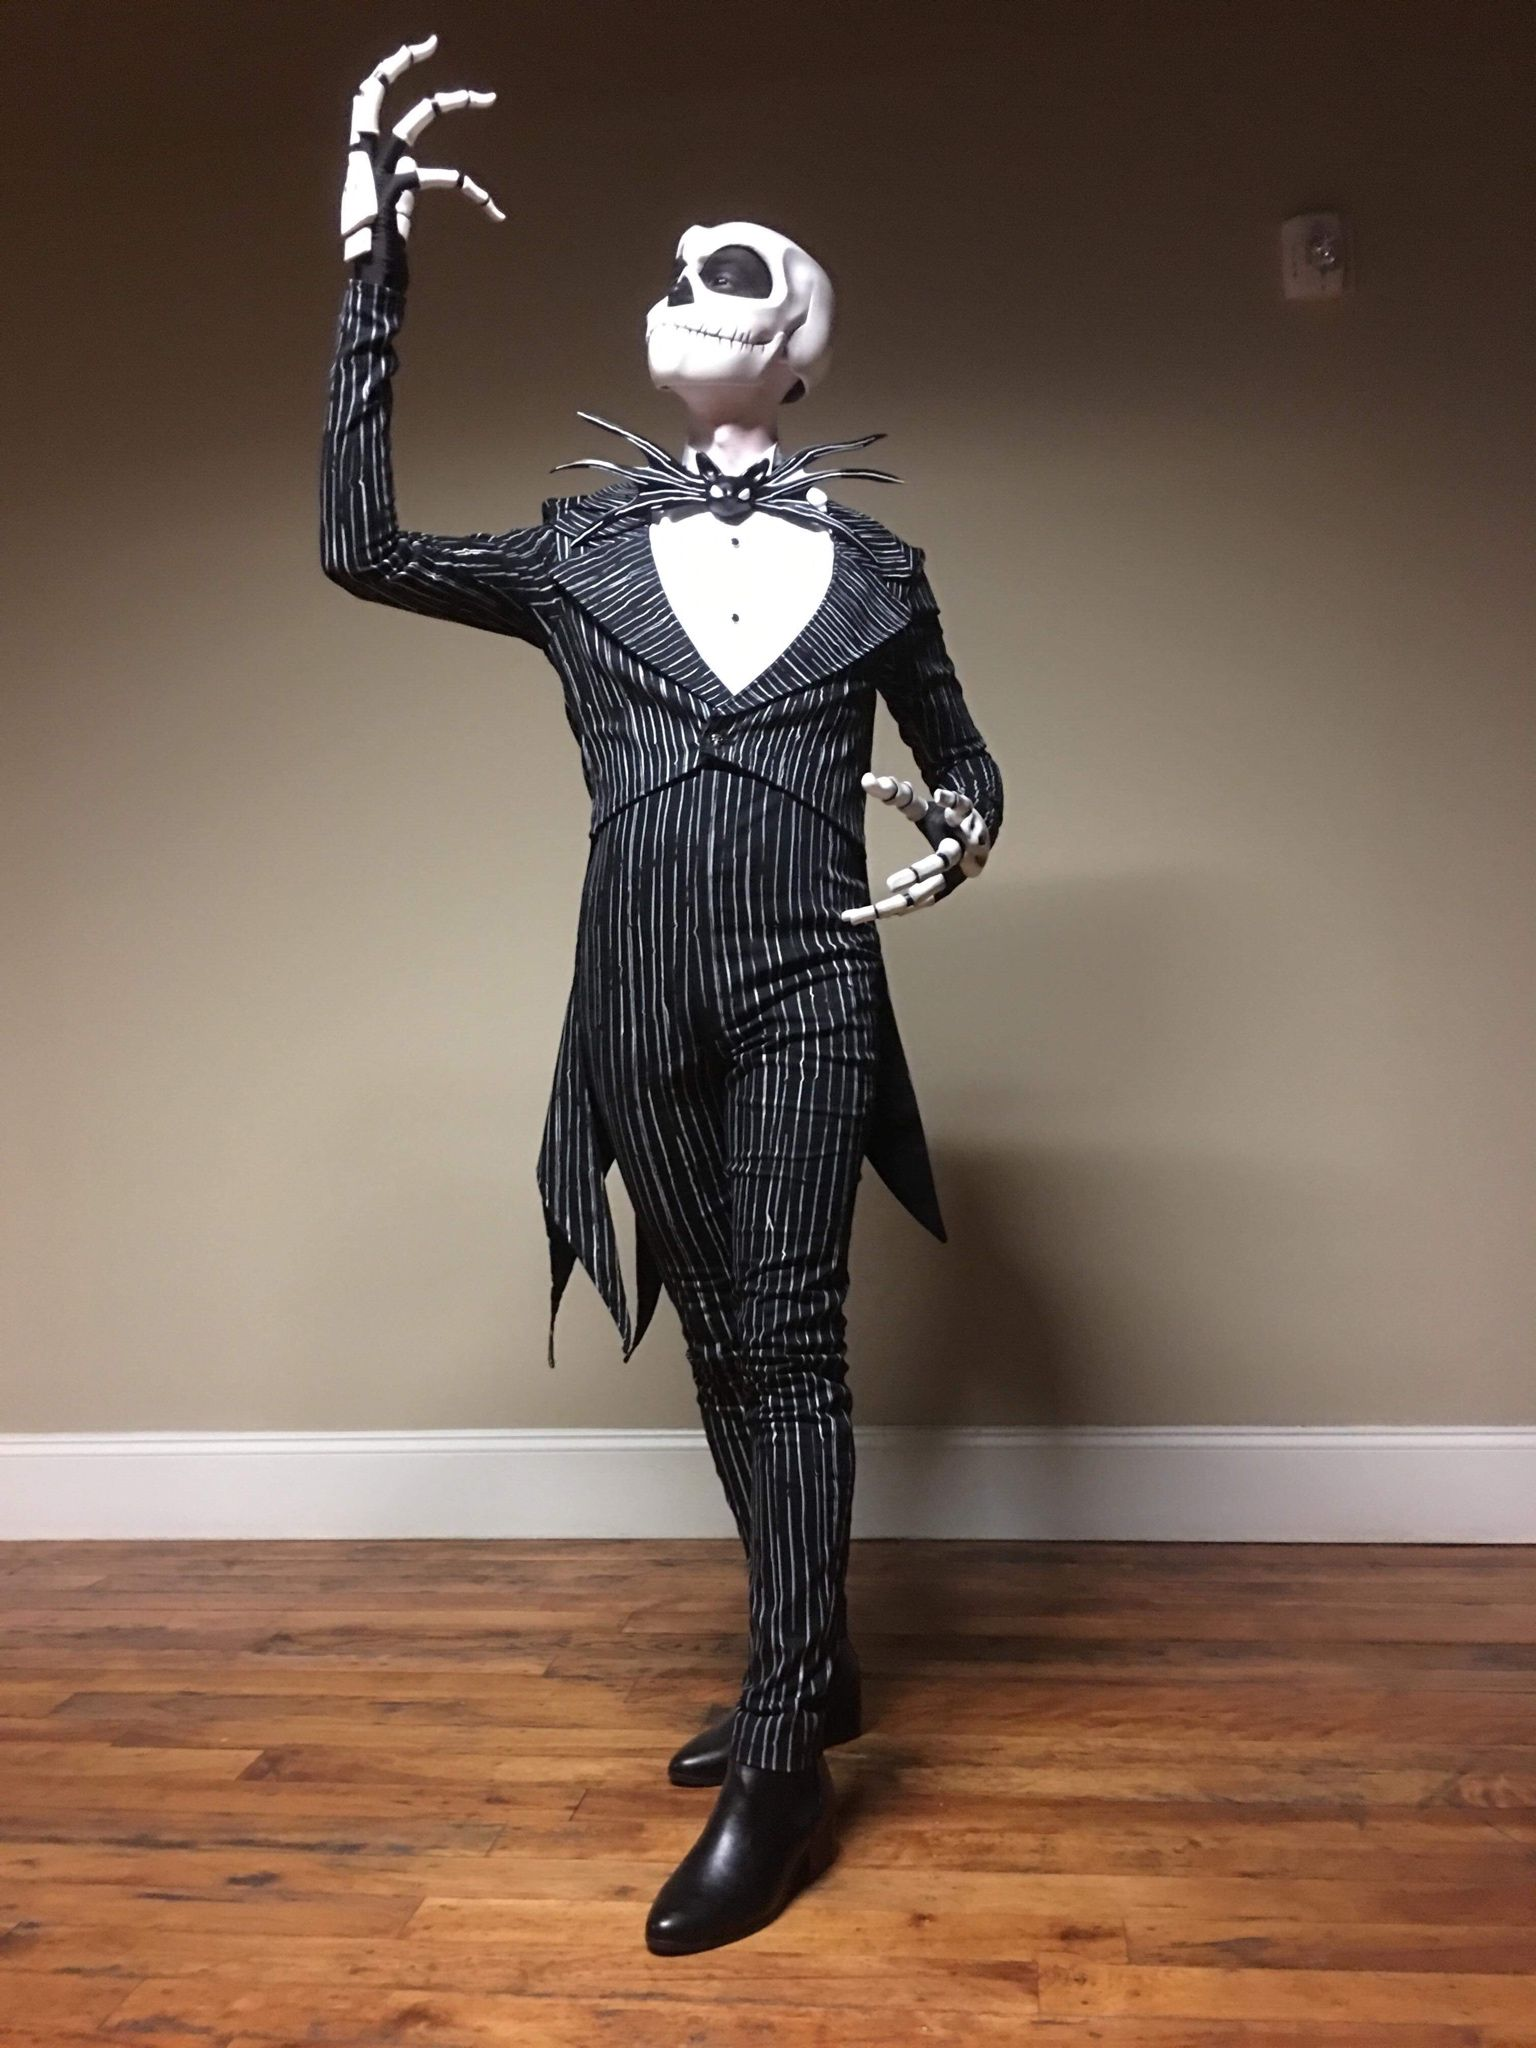 Happy Halloween SKELETON THE NIGHTMARE Pumpkin horror costume fancy dress Jumper